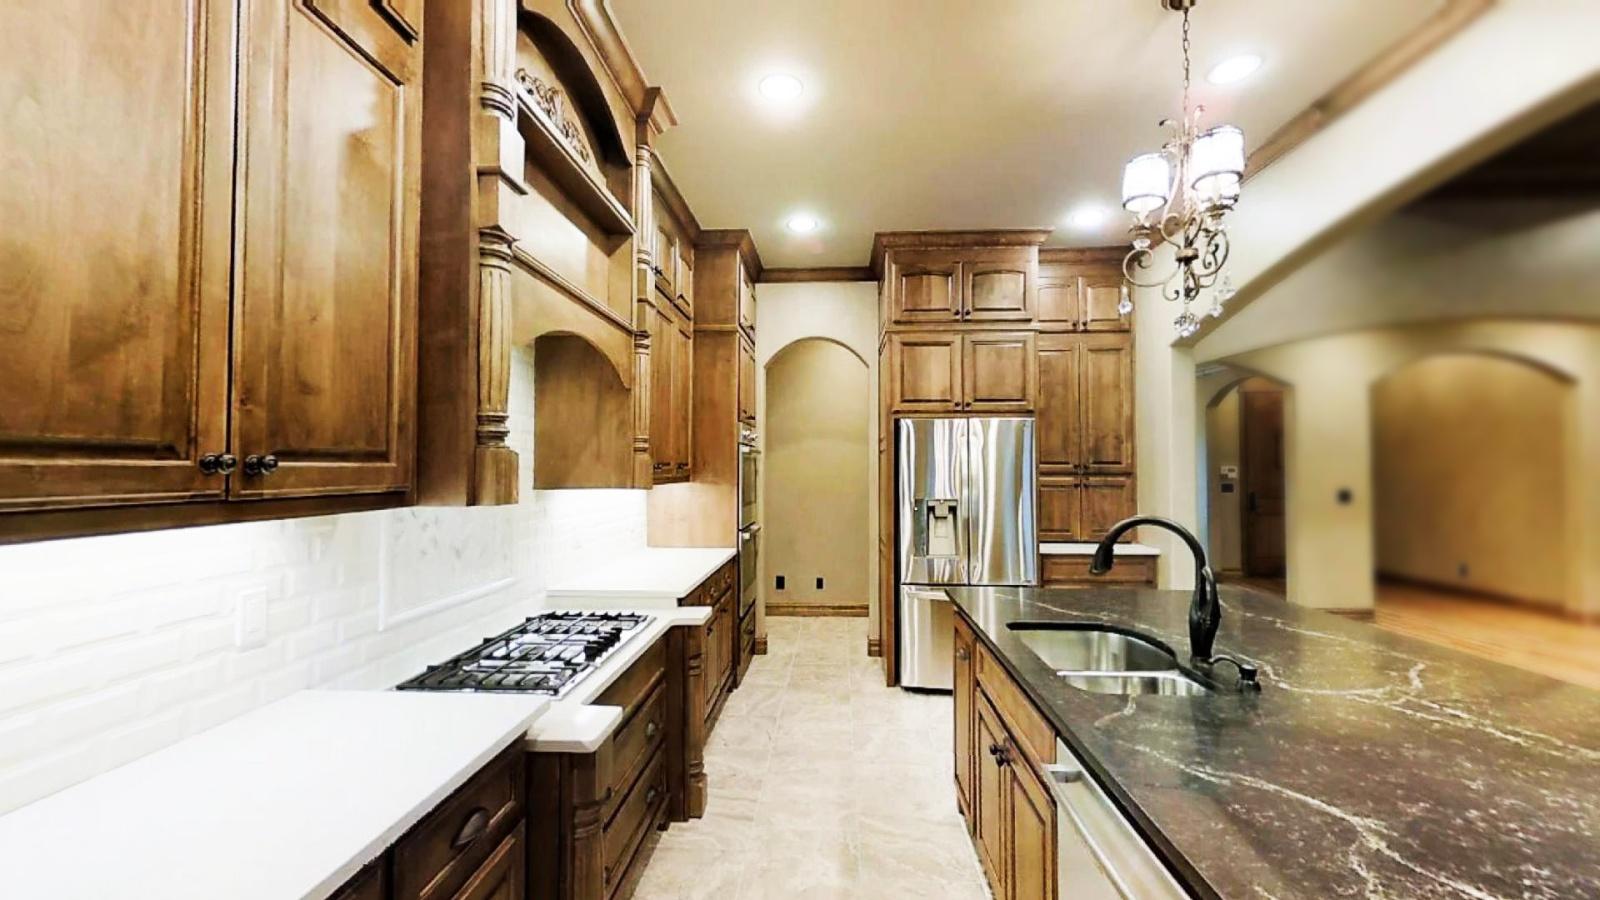 4 Bedrooms Bedrooms, ,4 BathroomsBathrooms,Custom Home,Home Plans,1088